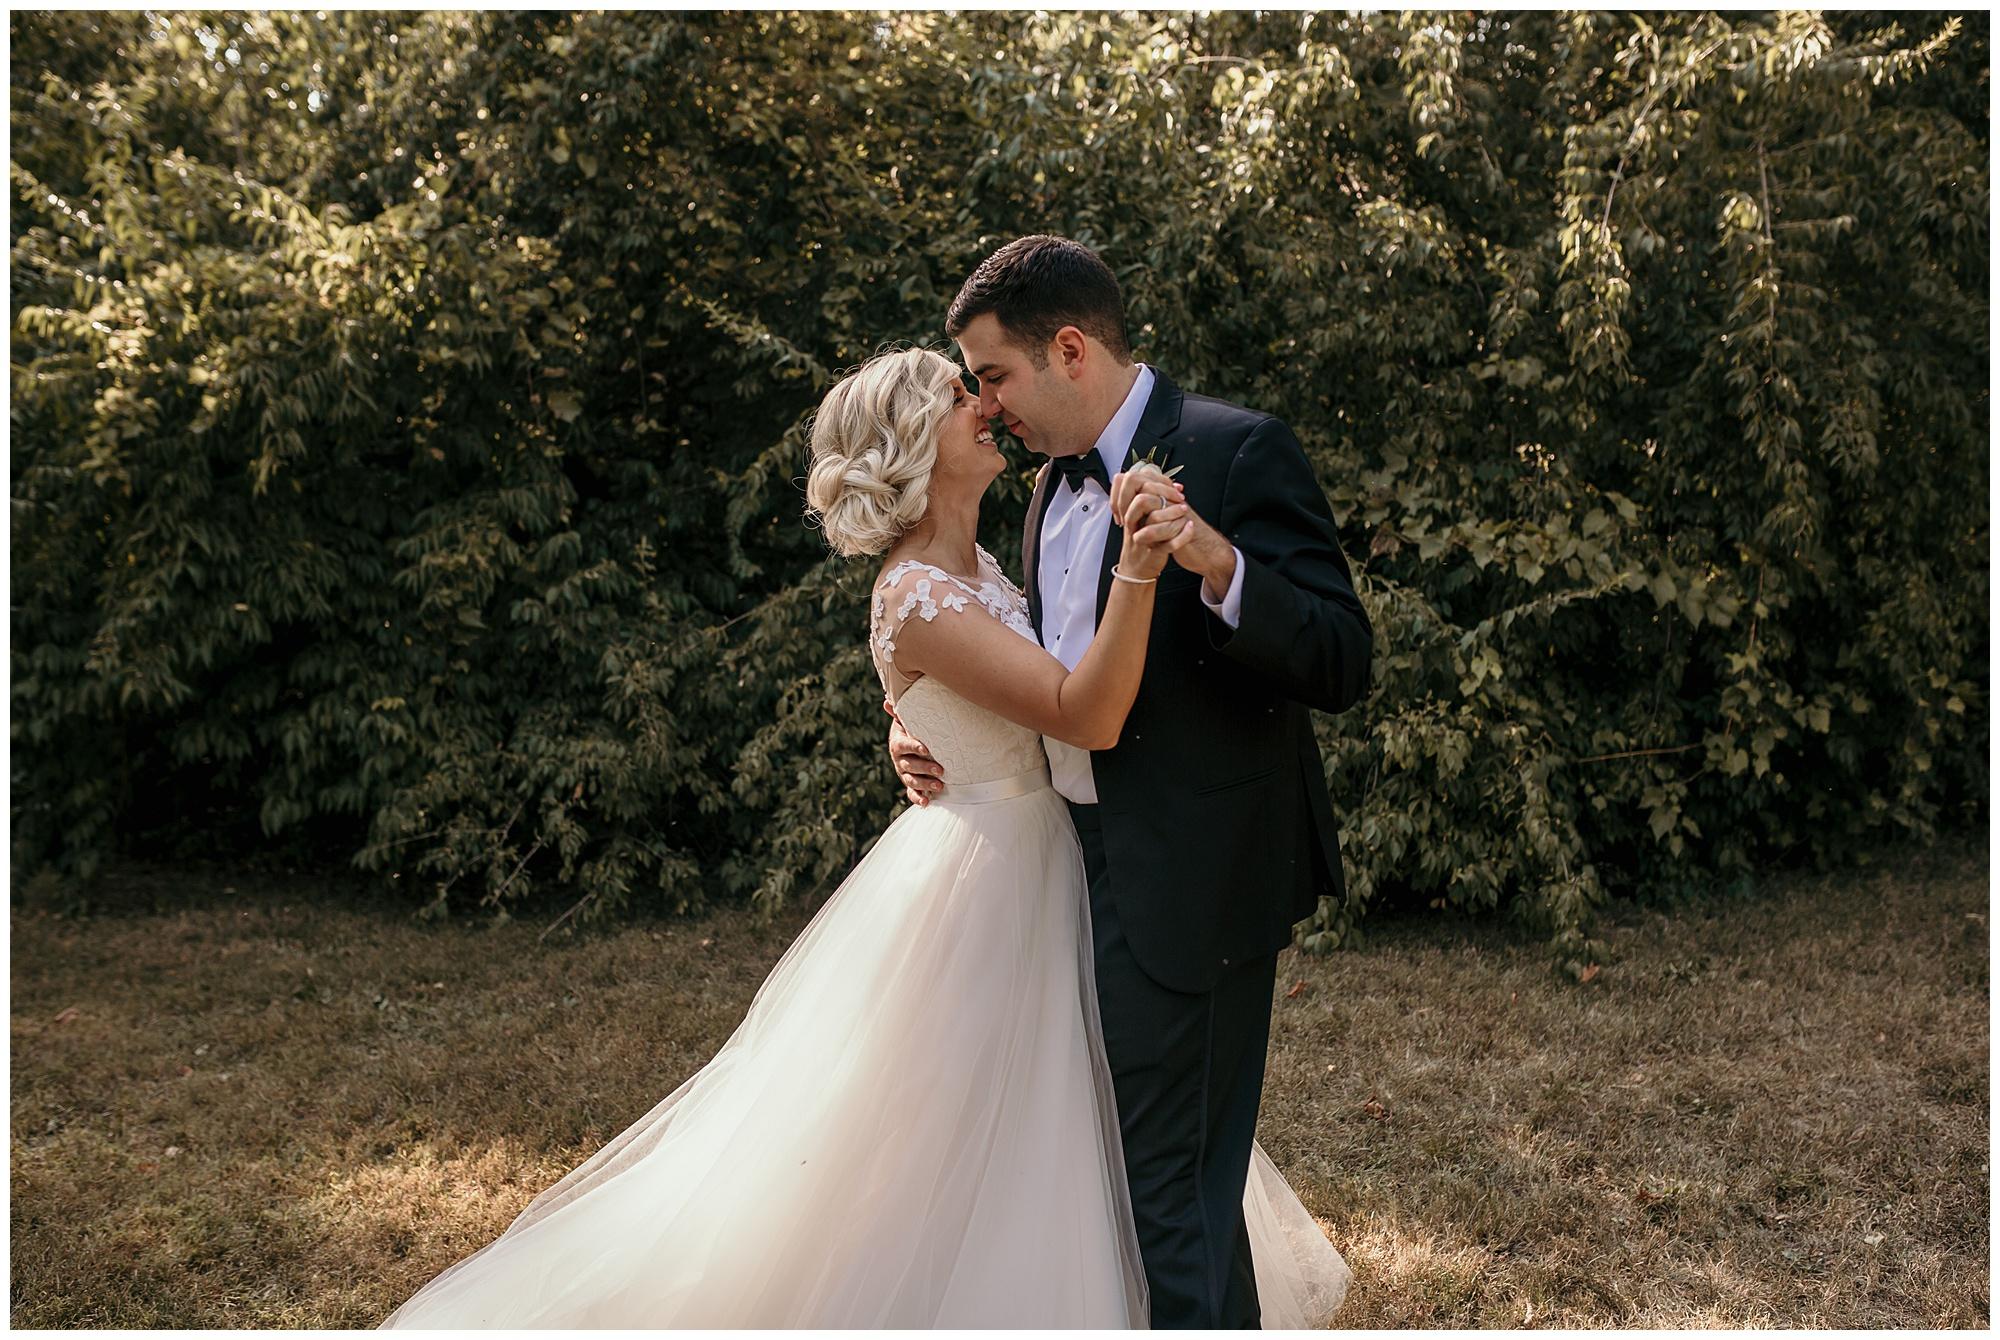 pear_tree_estate_wedding_champaign_il_wright_photographs_jj_0085.jpg